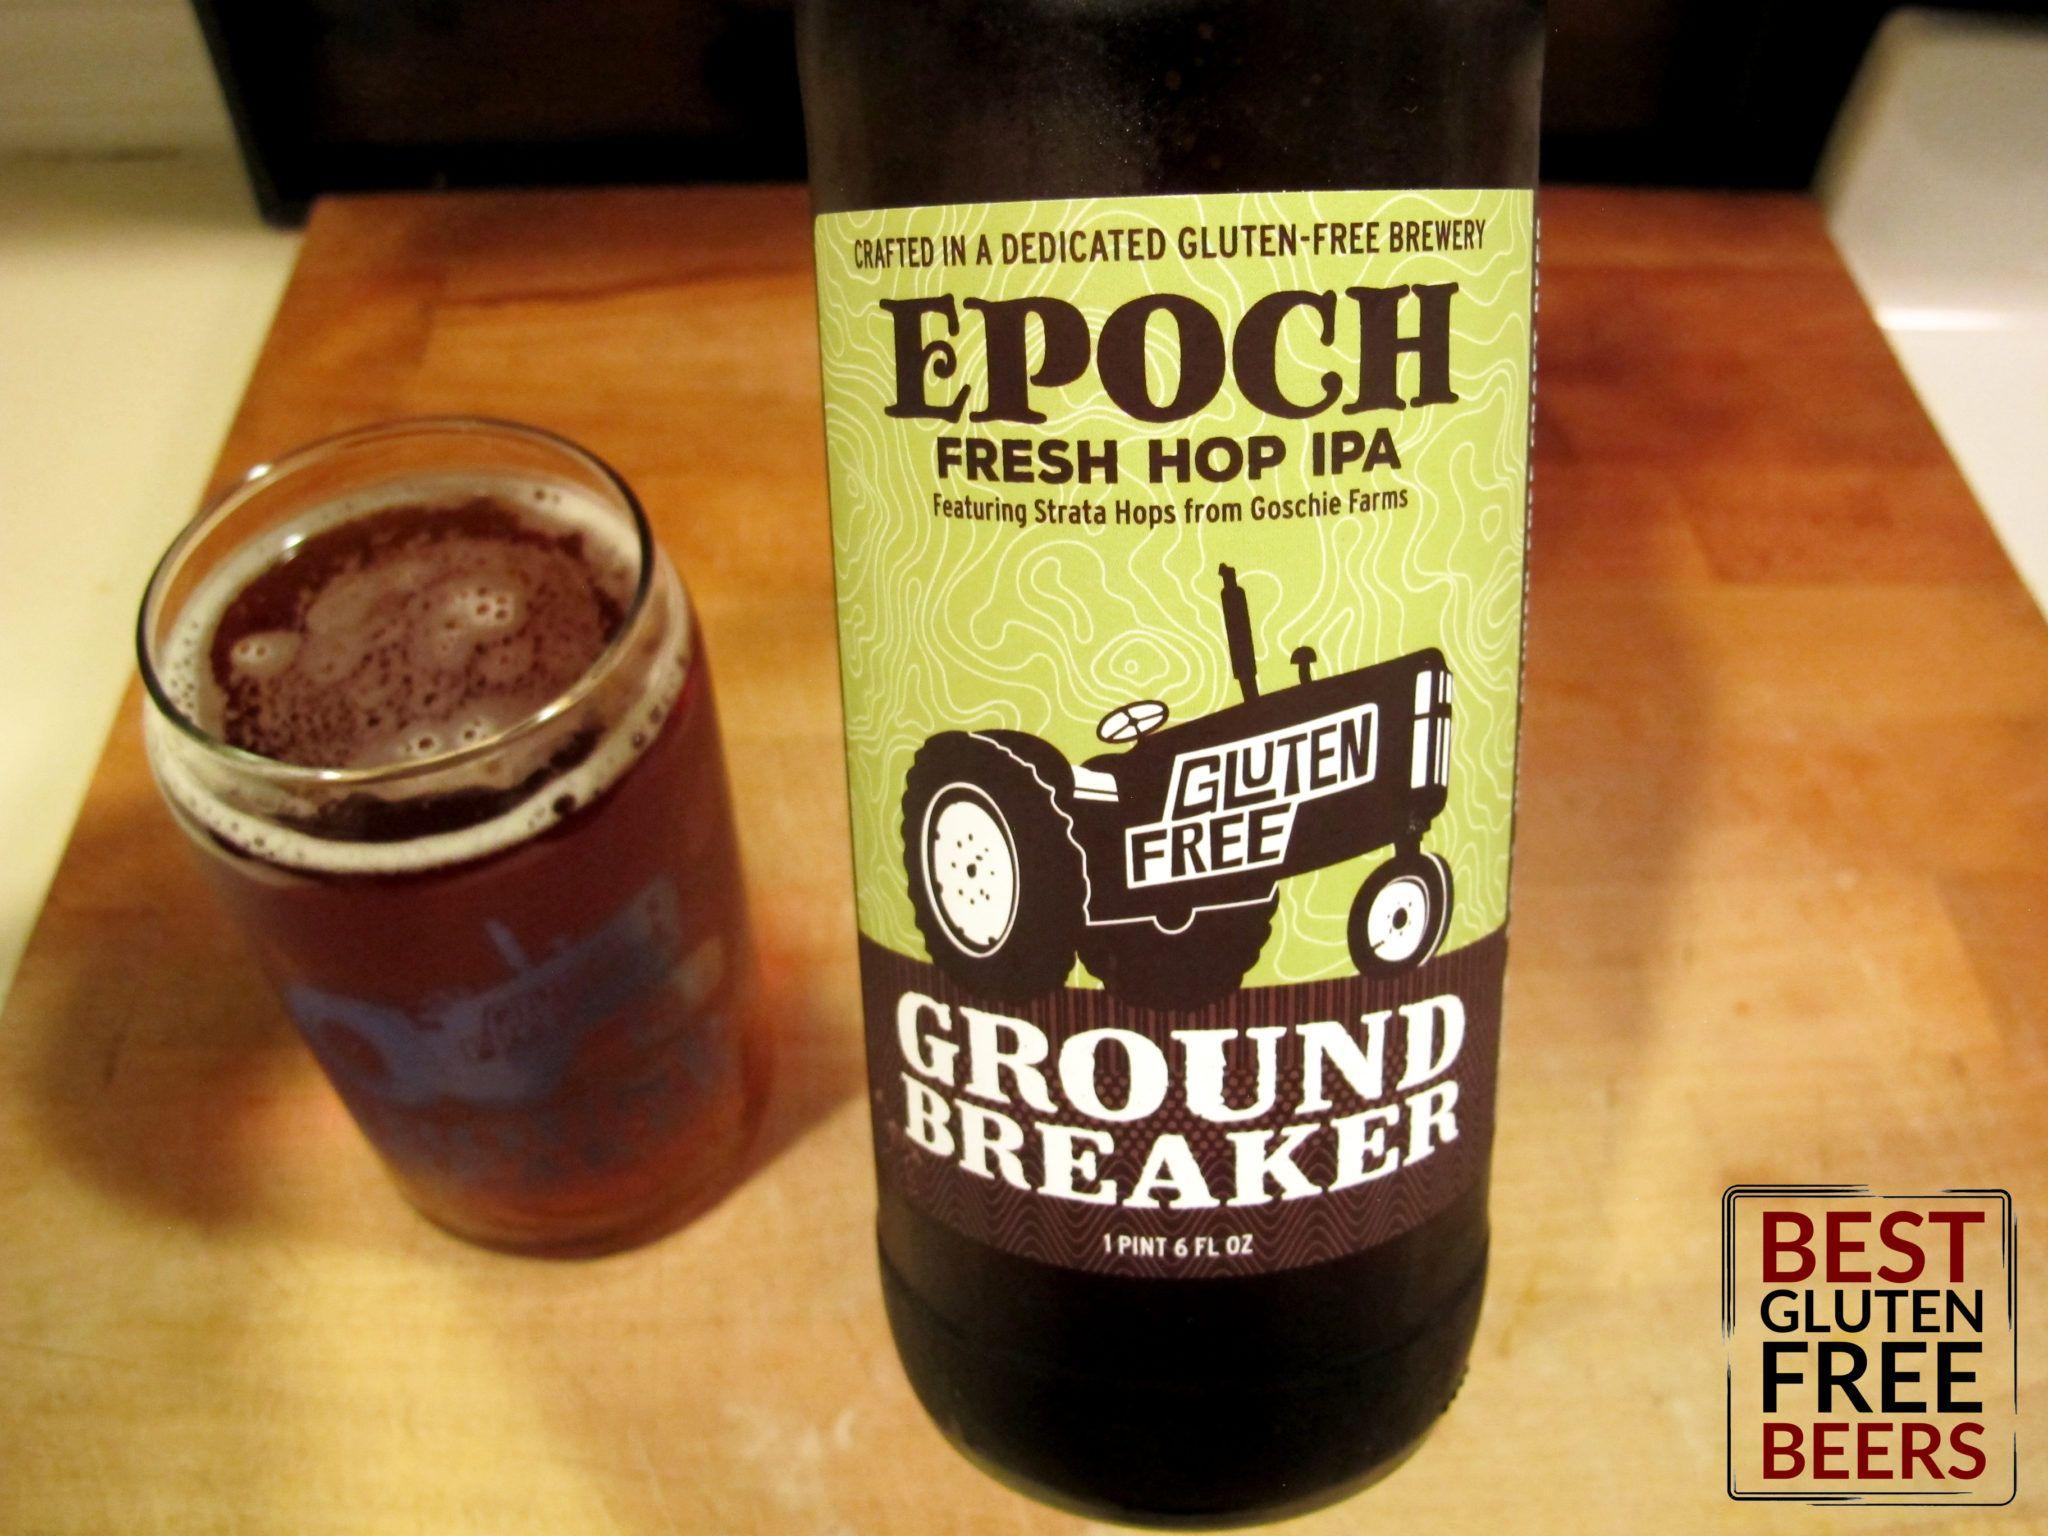 Epoch IPA - Ground Breaker Epoch Fresh Hop IPA Gluten Free Beer Review